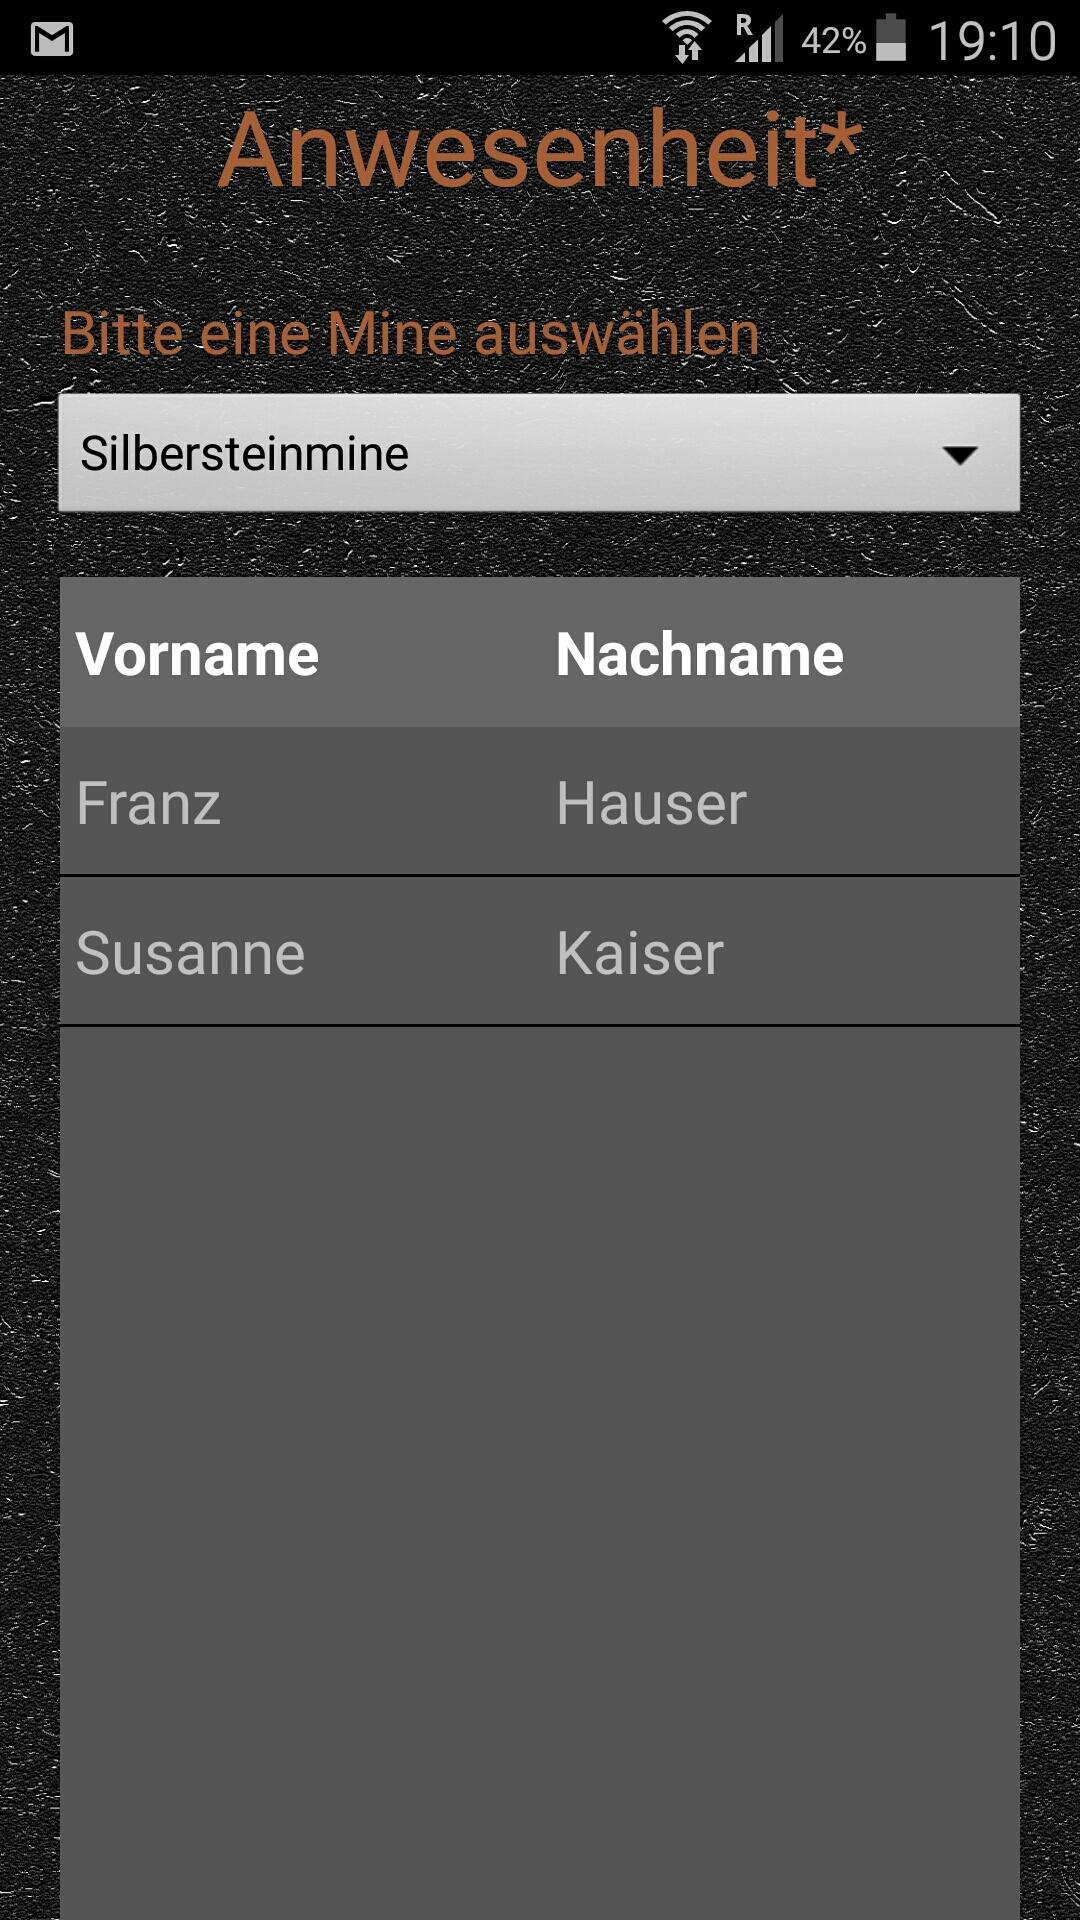 ginstr_app_miningSiteAttendance_DE_7